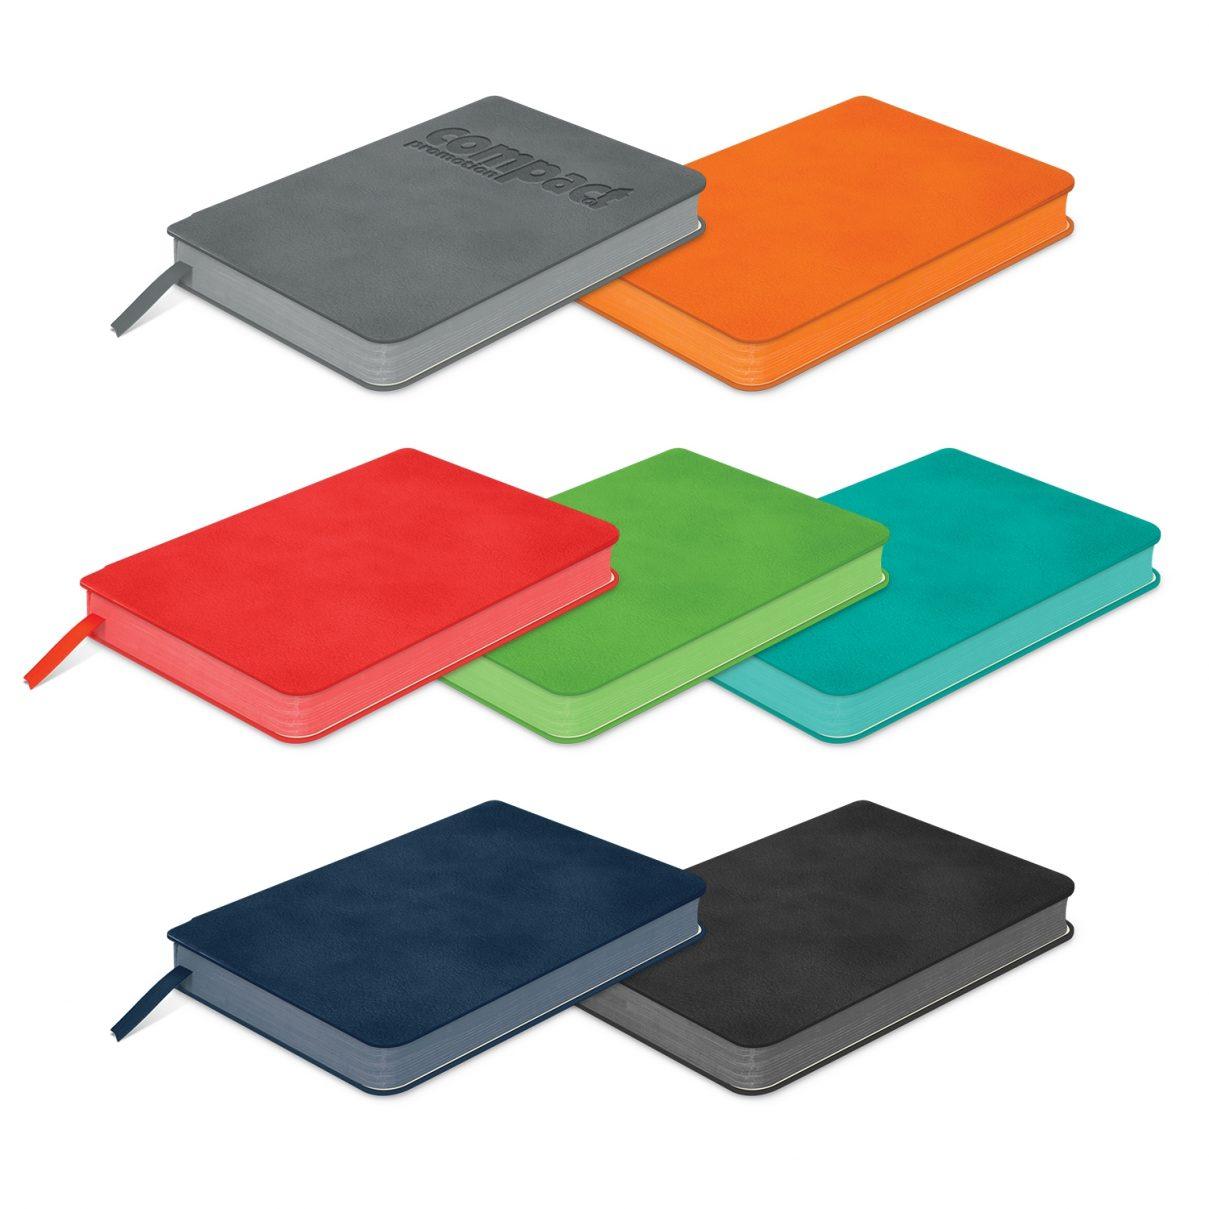 Demio Notebook - Small Bulk Supplier